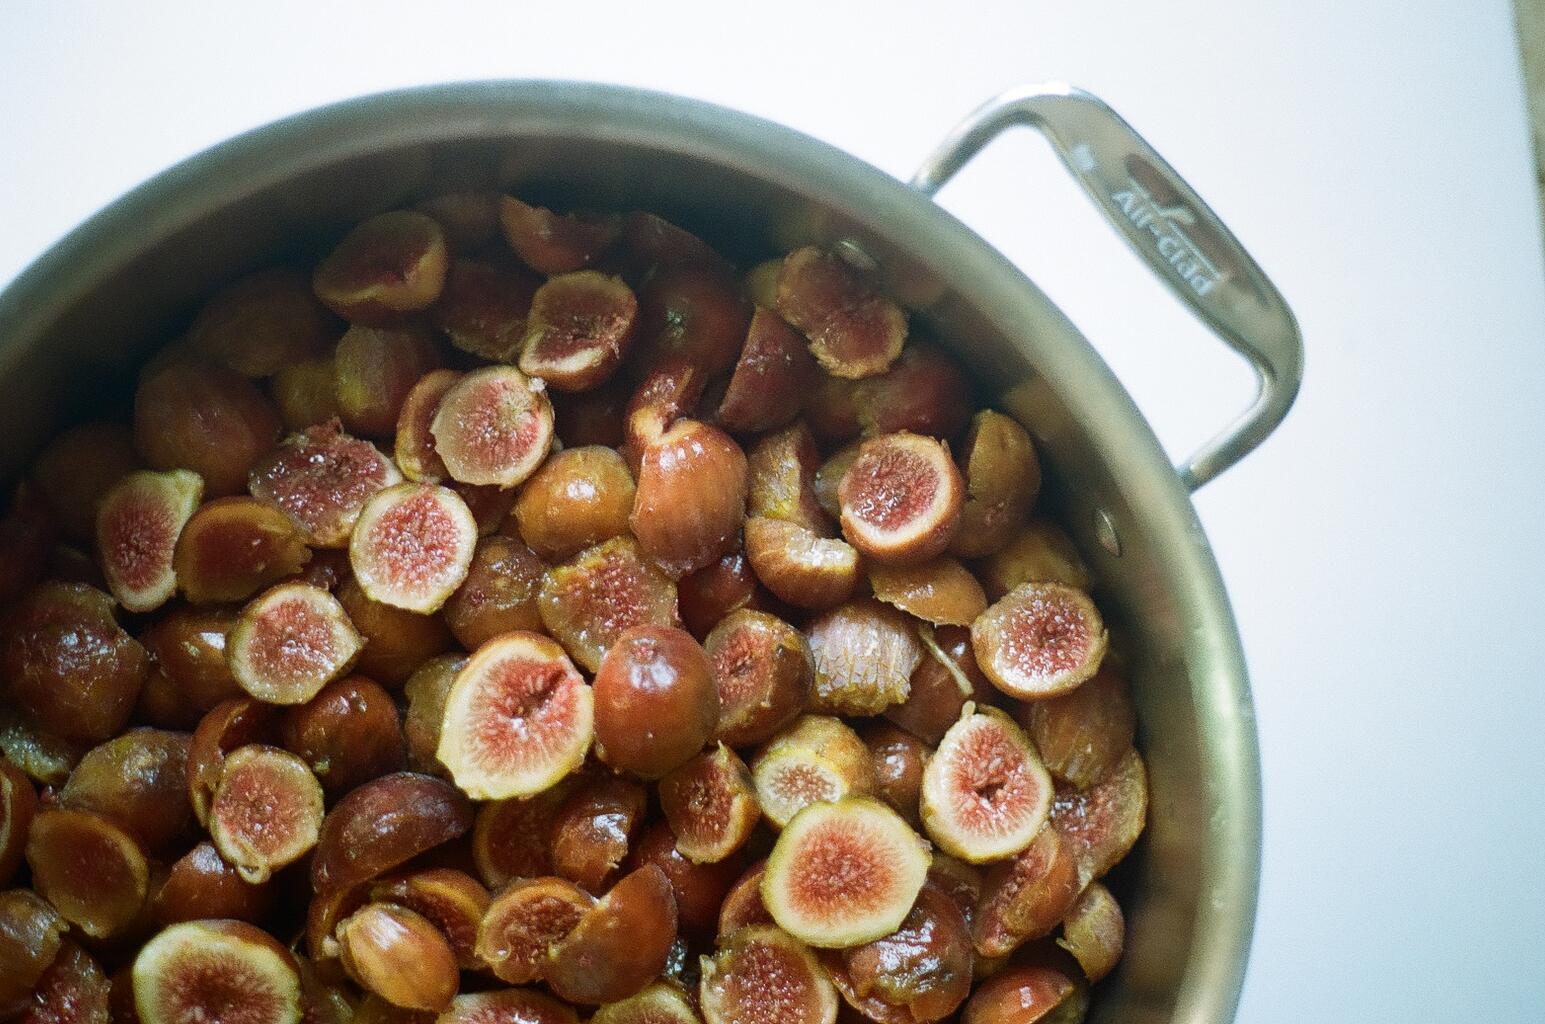 Figs - 2